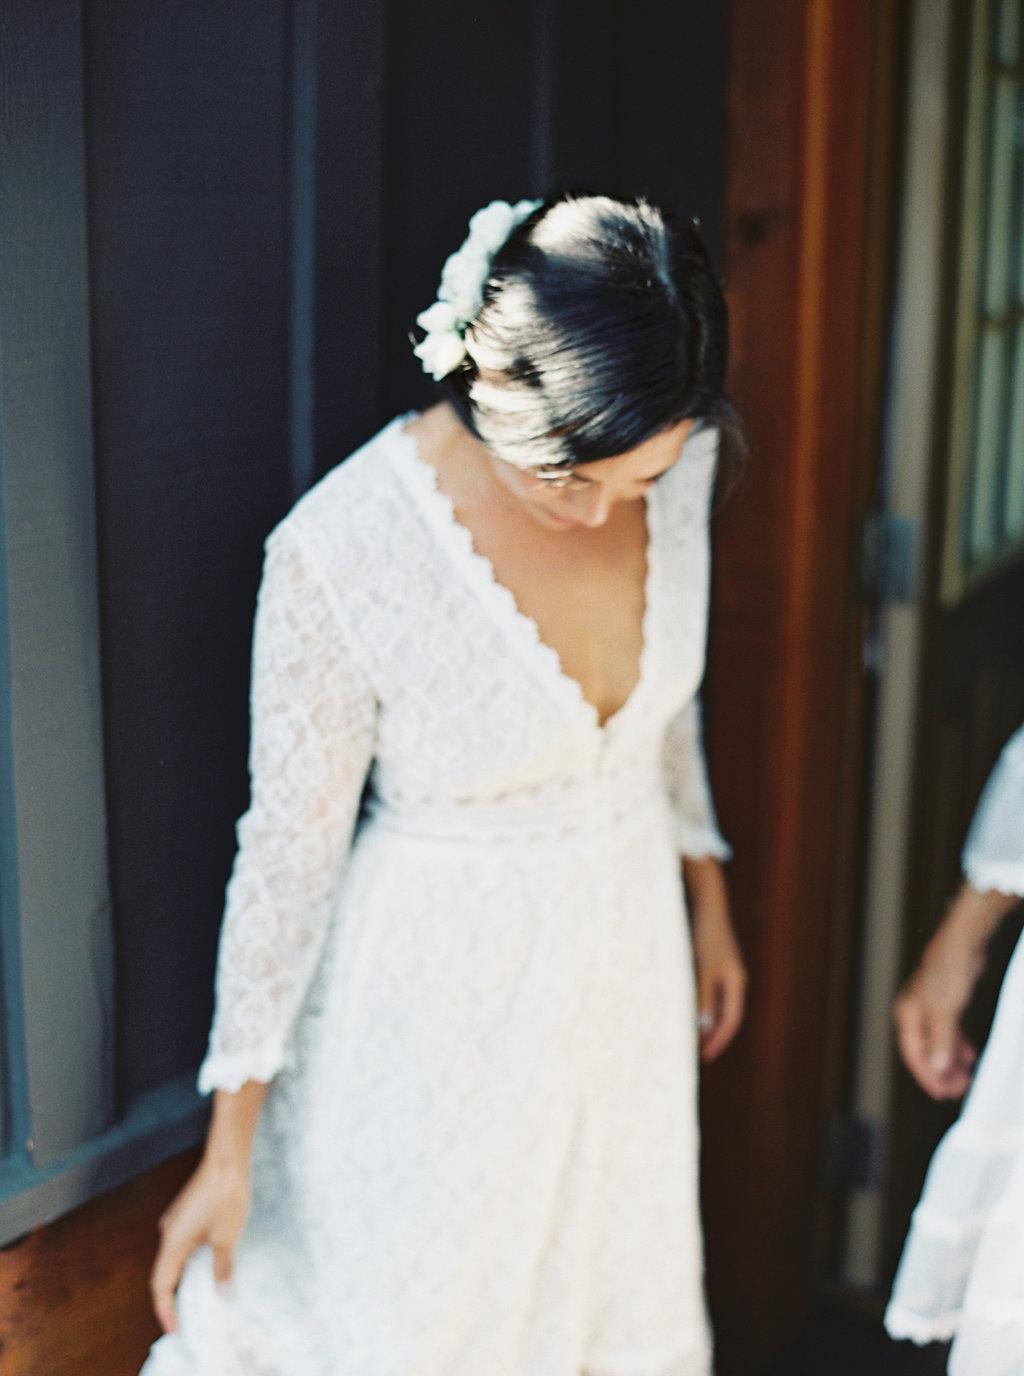 000010_gallardo_wedding_film0038.jpg